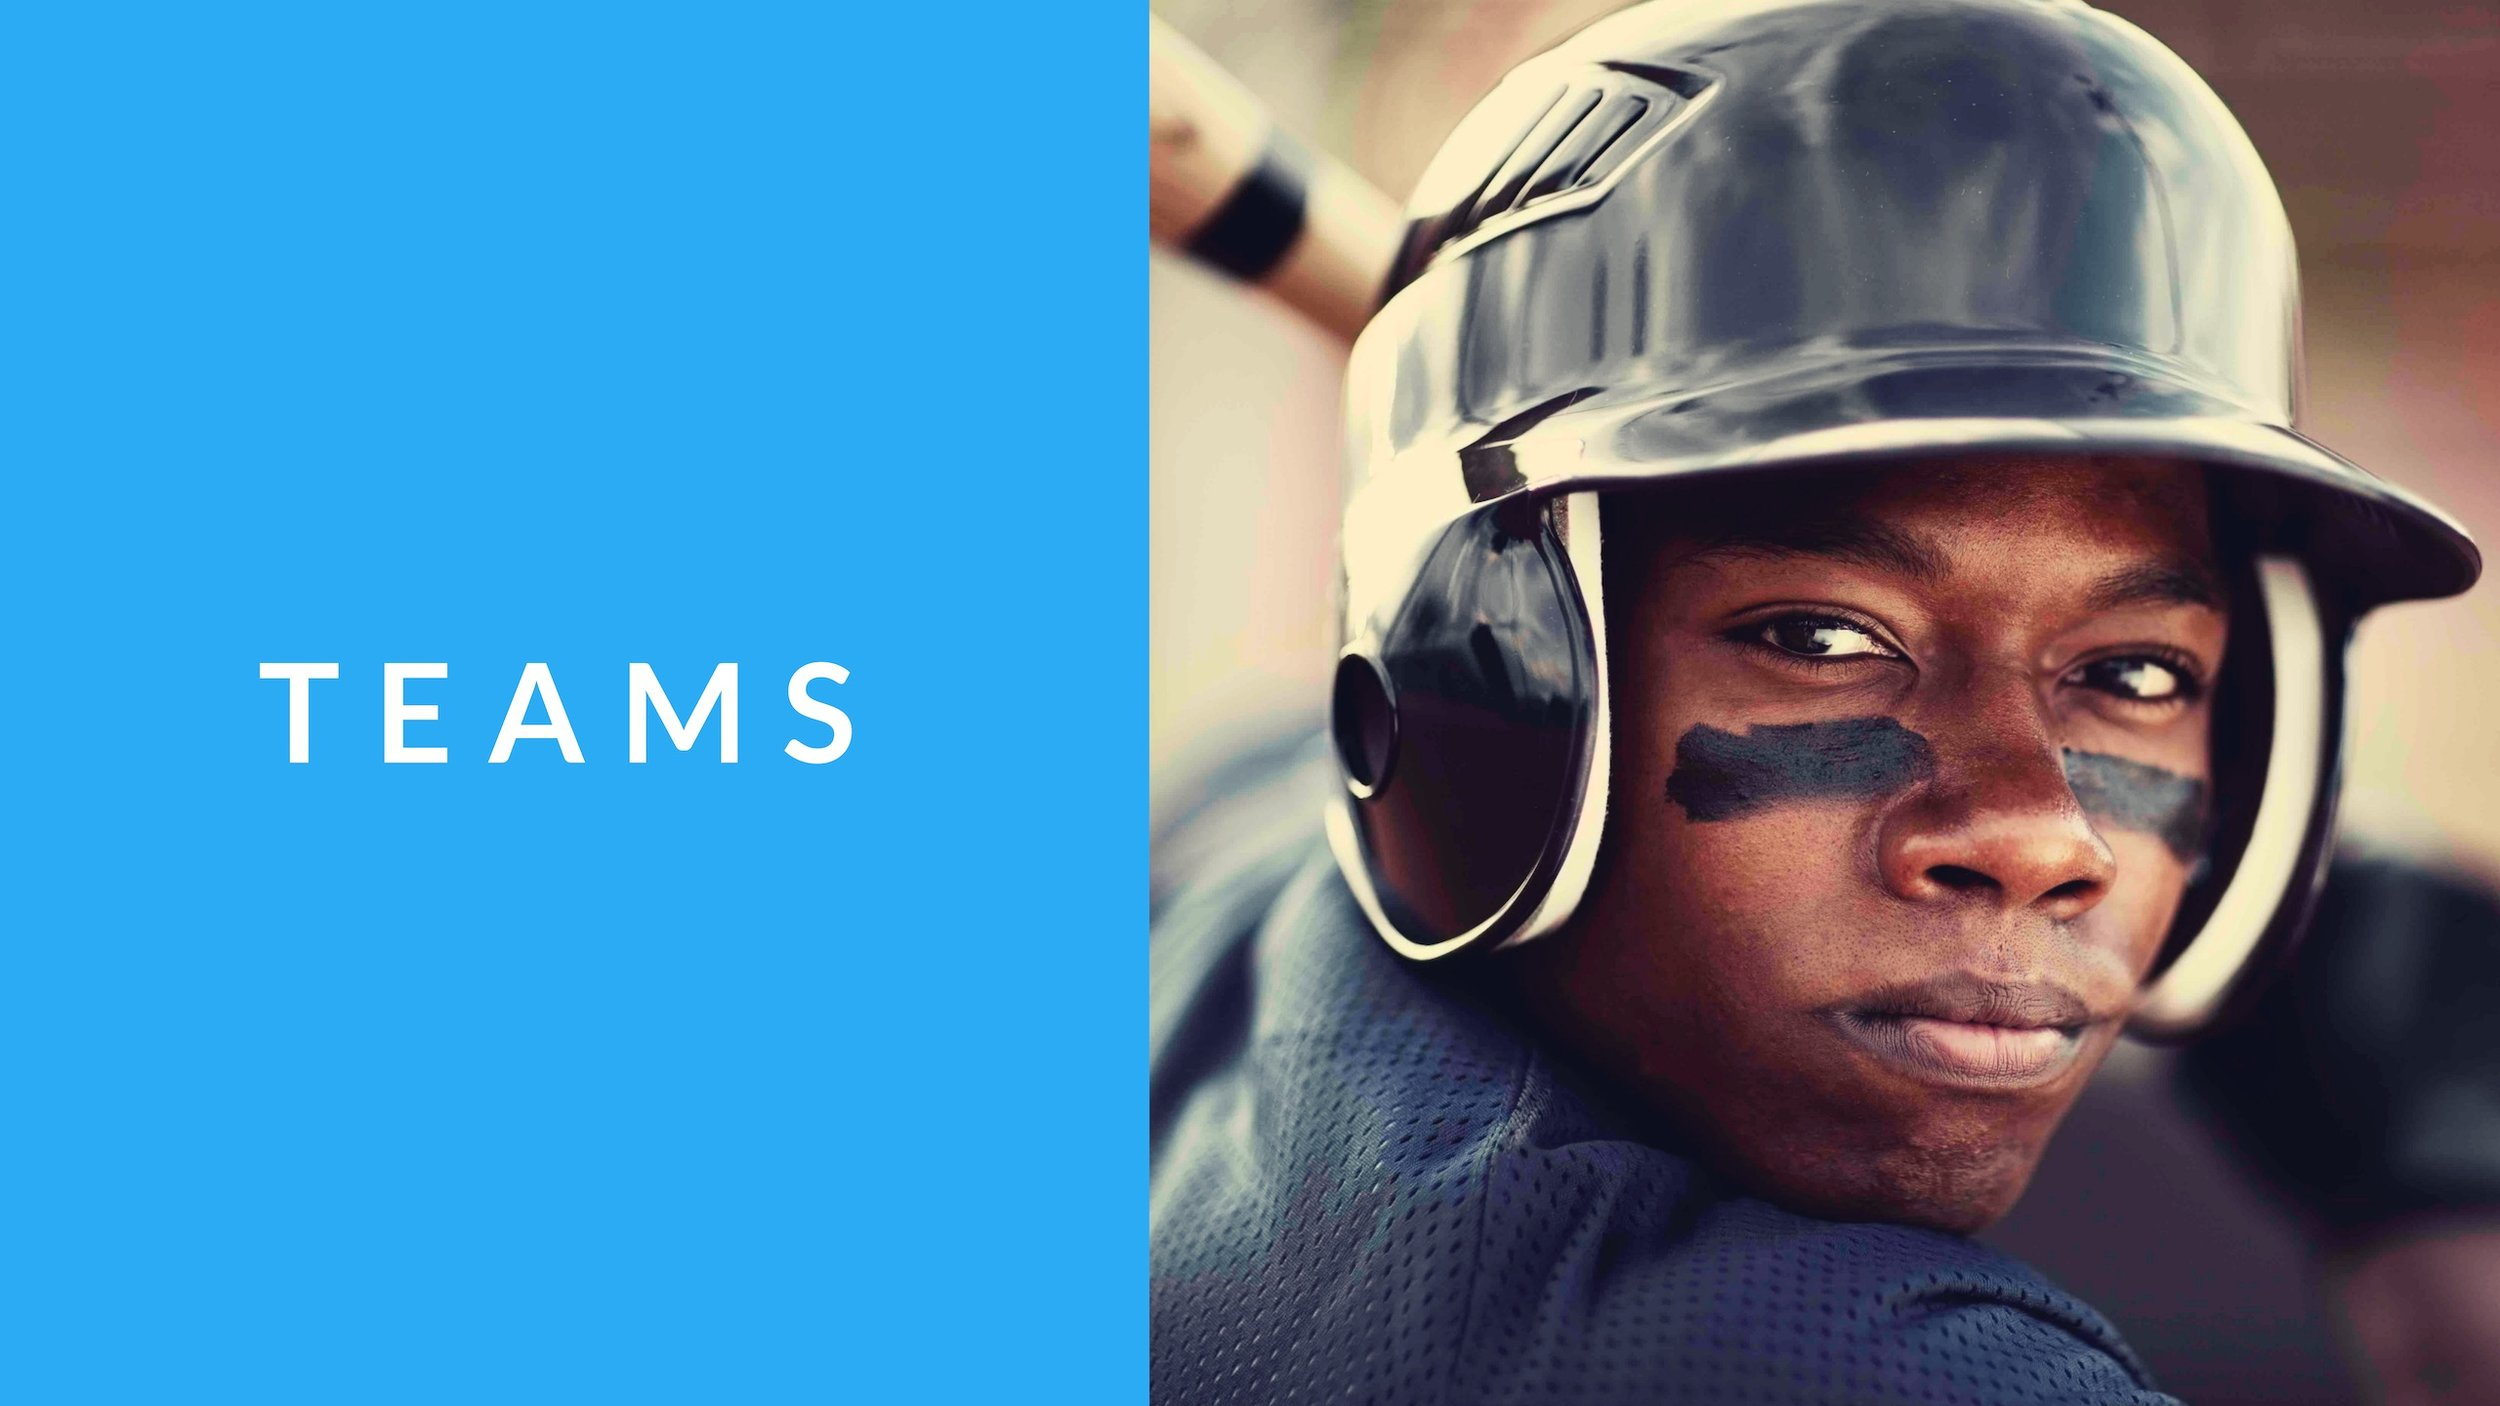 Design - Teams-txt-jpeg.jpg